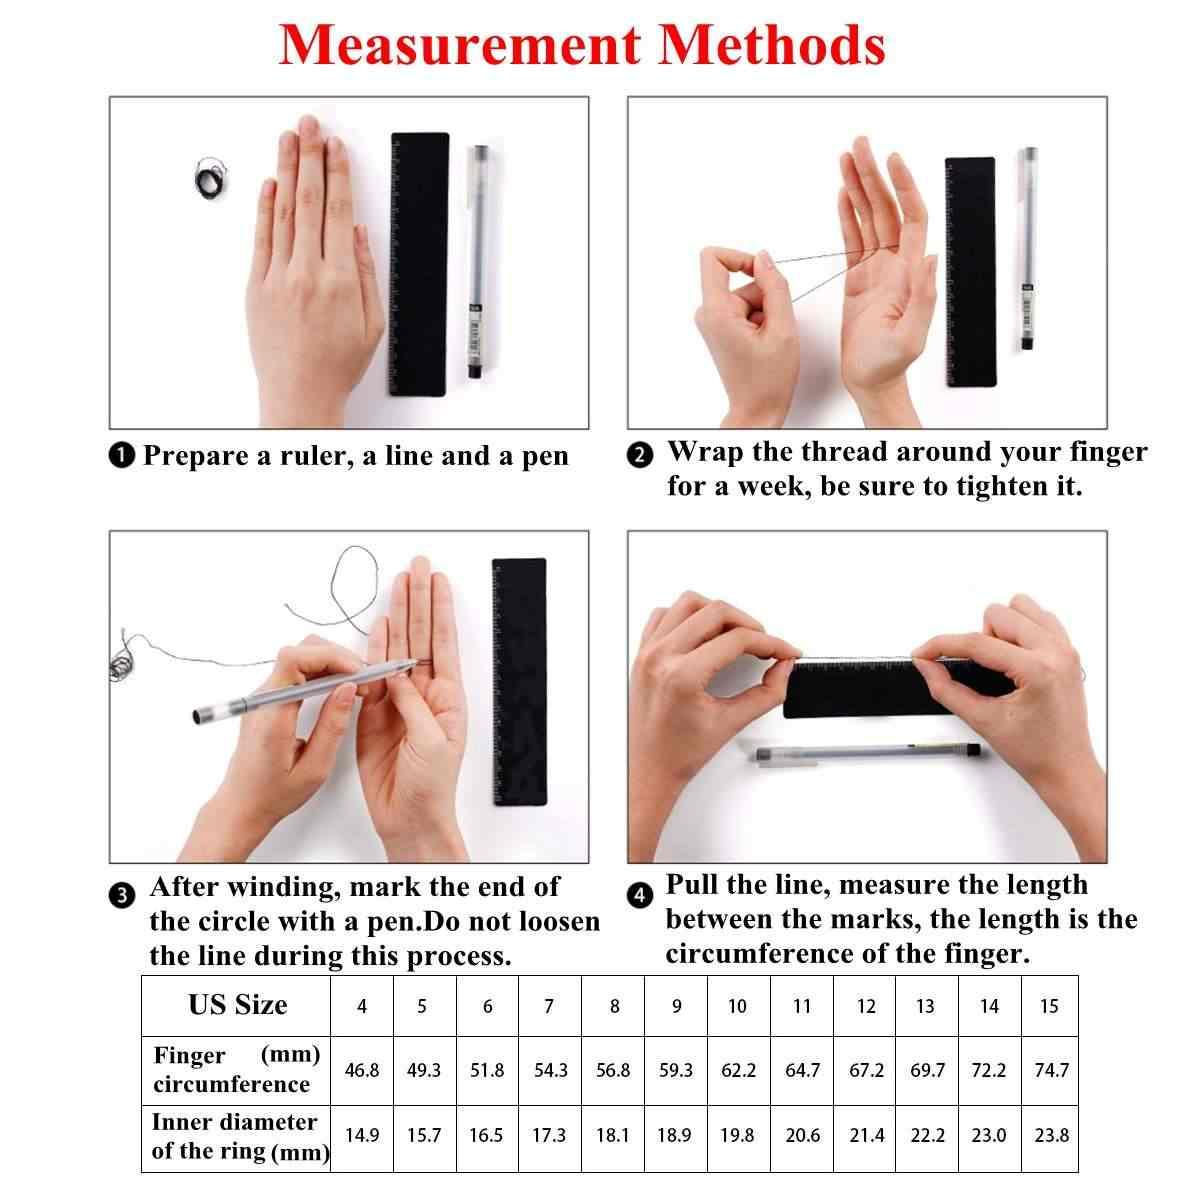 NFC חכם טבעת IC תעודת זהות עבור NFC נייד טלפון אינטליגנטי שבב נירוסטה קסם אצבע NFC טבעת עמיד למים חכם טבעת